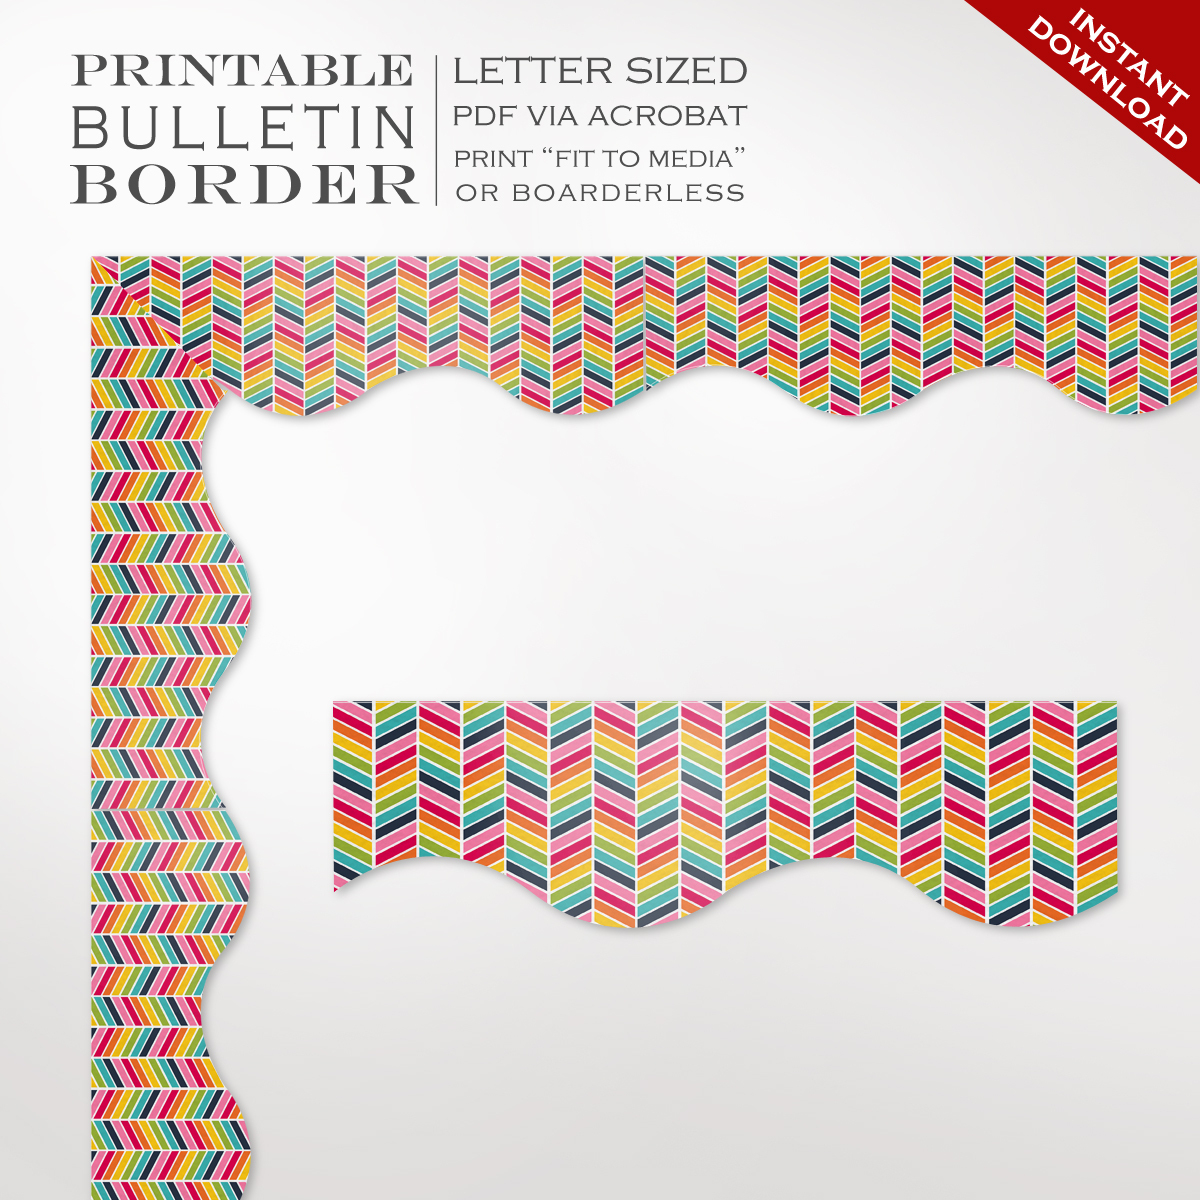 Classroom Bulletin Board Trim - Printable Rainbow Chevron Border - Free Printable Christmas Bulletin Board Borders